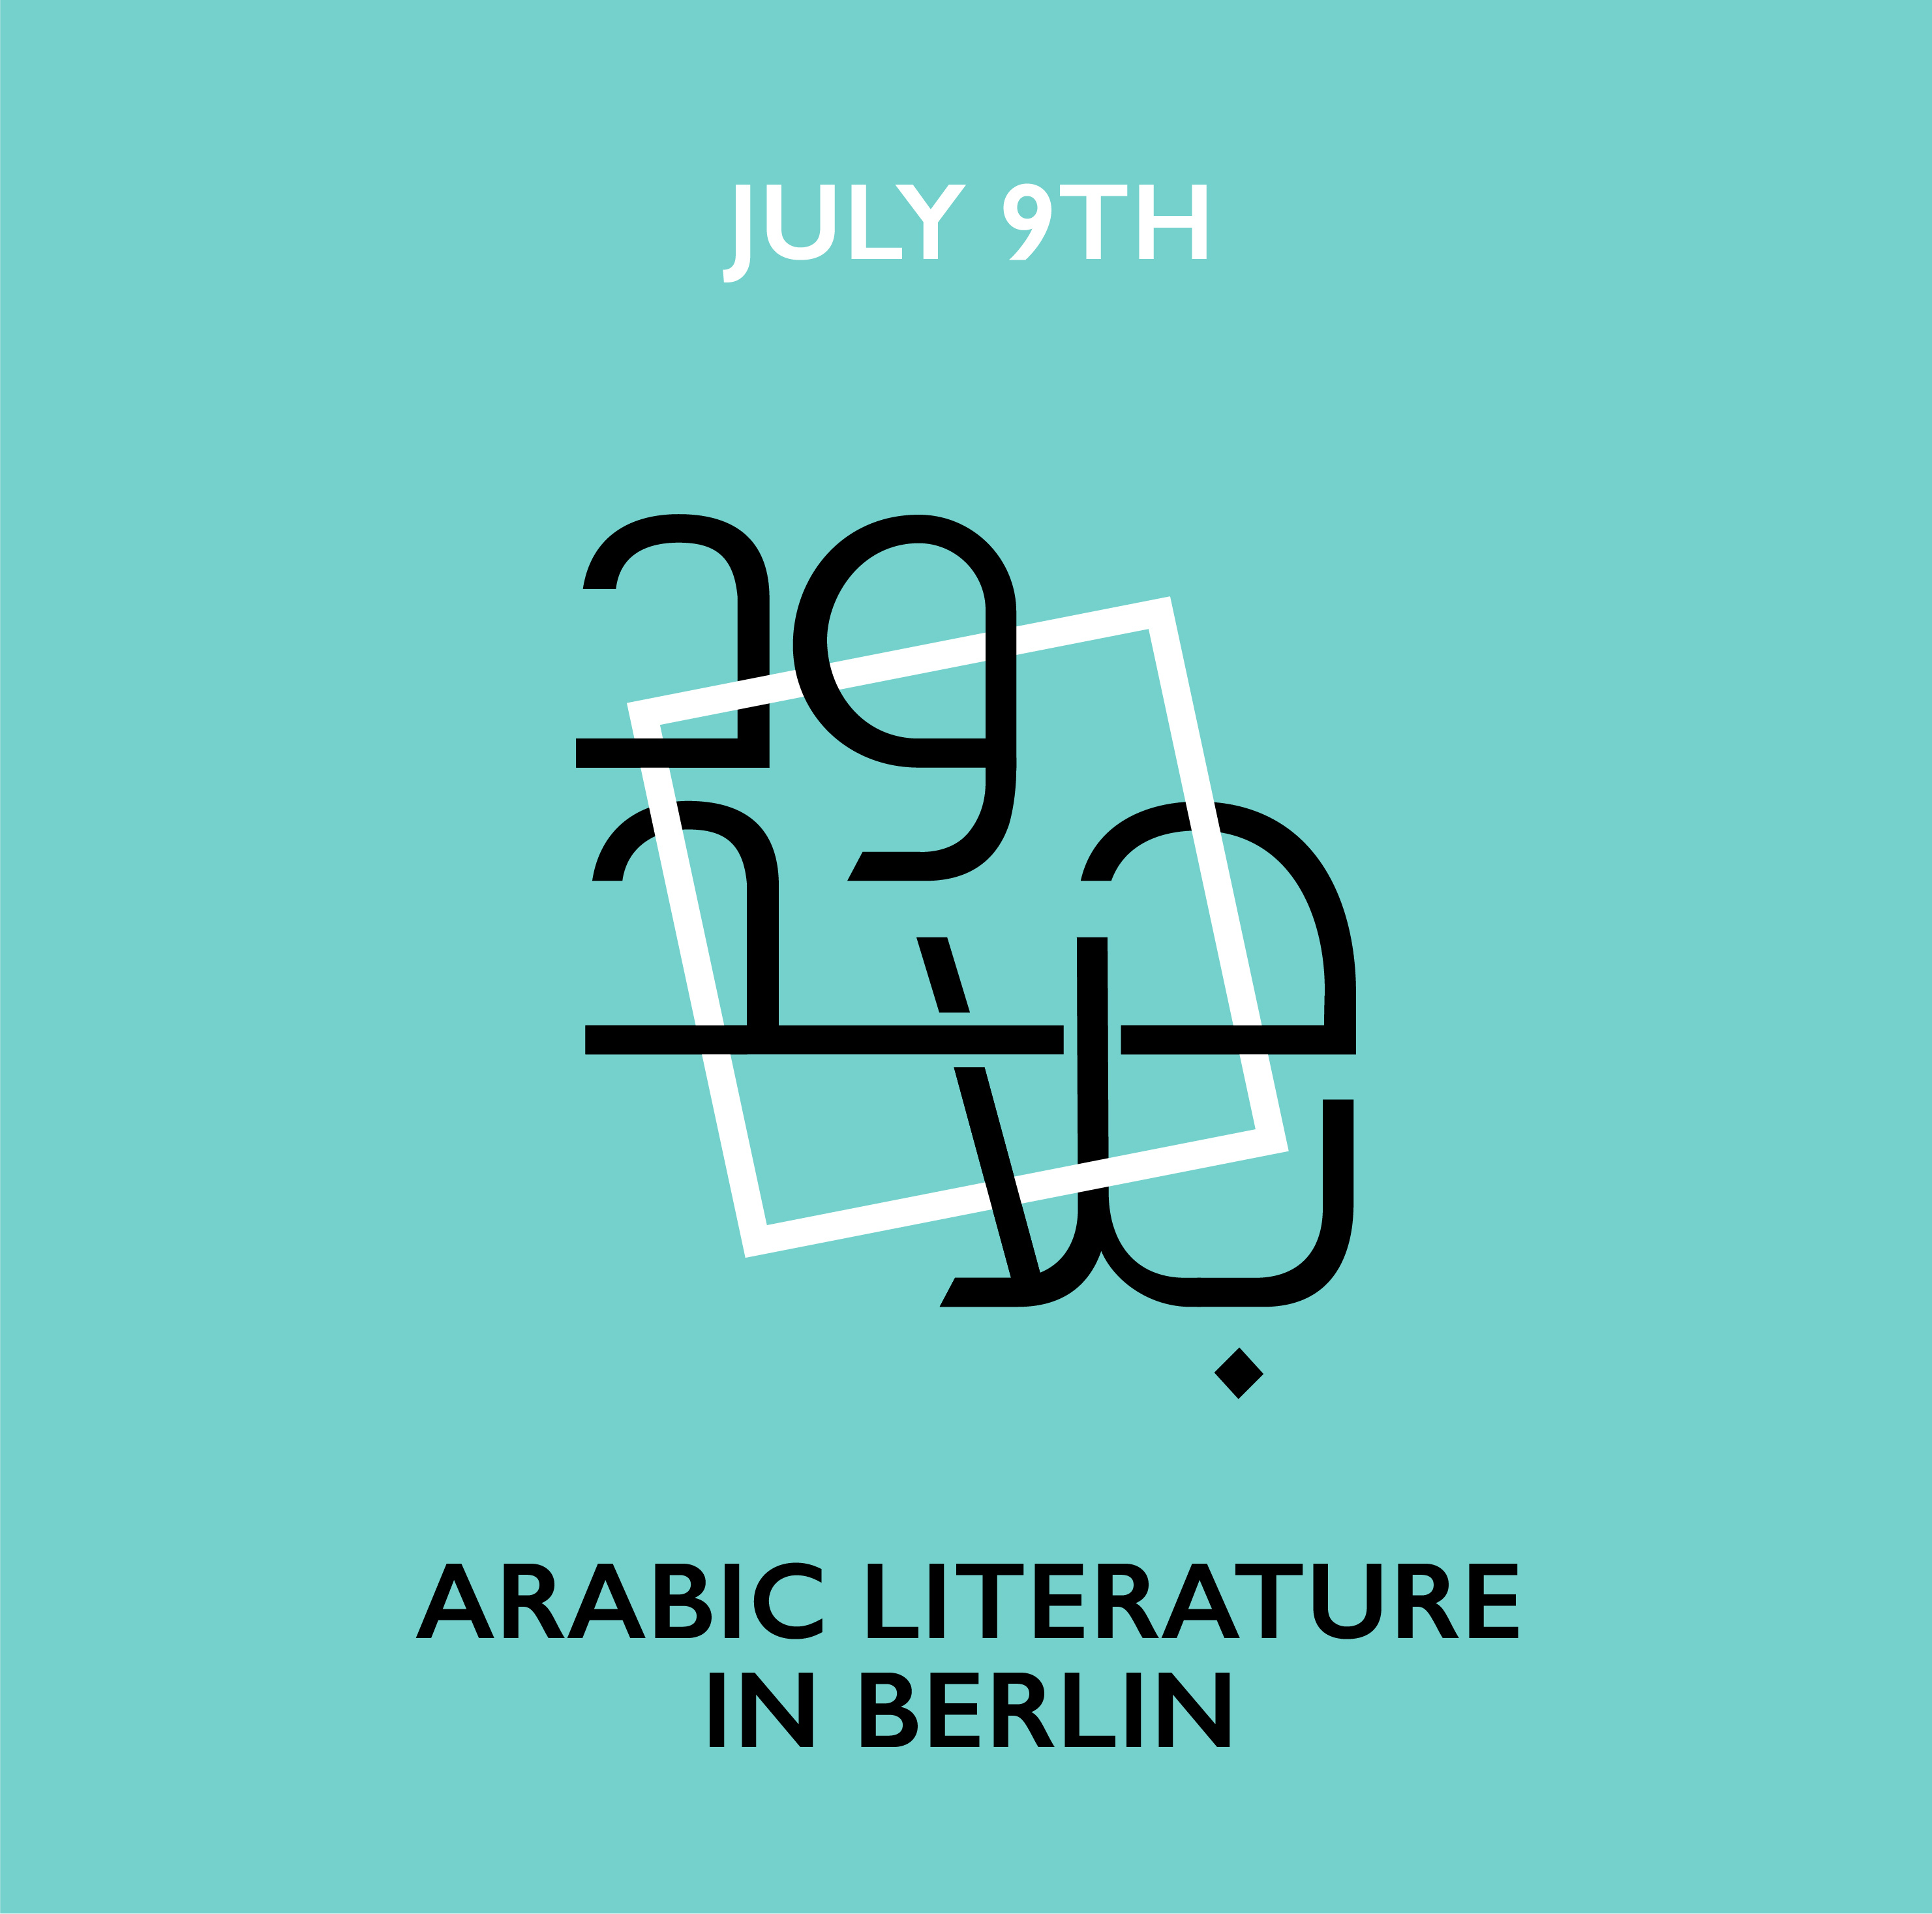 https://arablit.files.wordpress.com/2021/06/panel_berlin-01.jpg